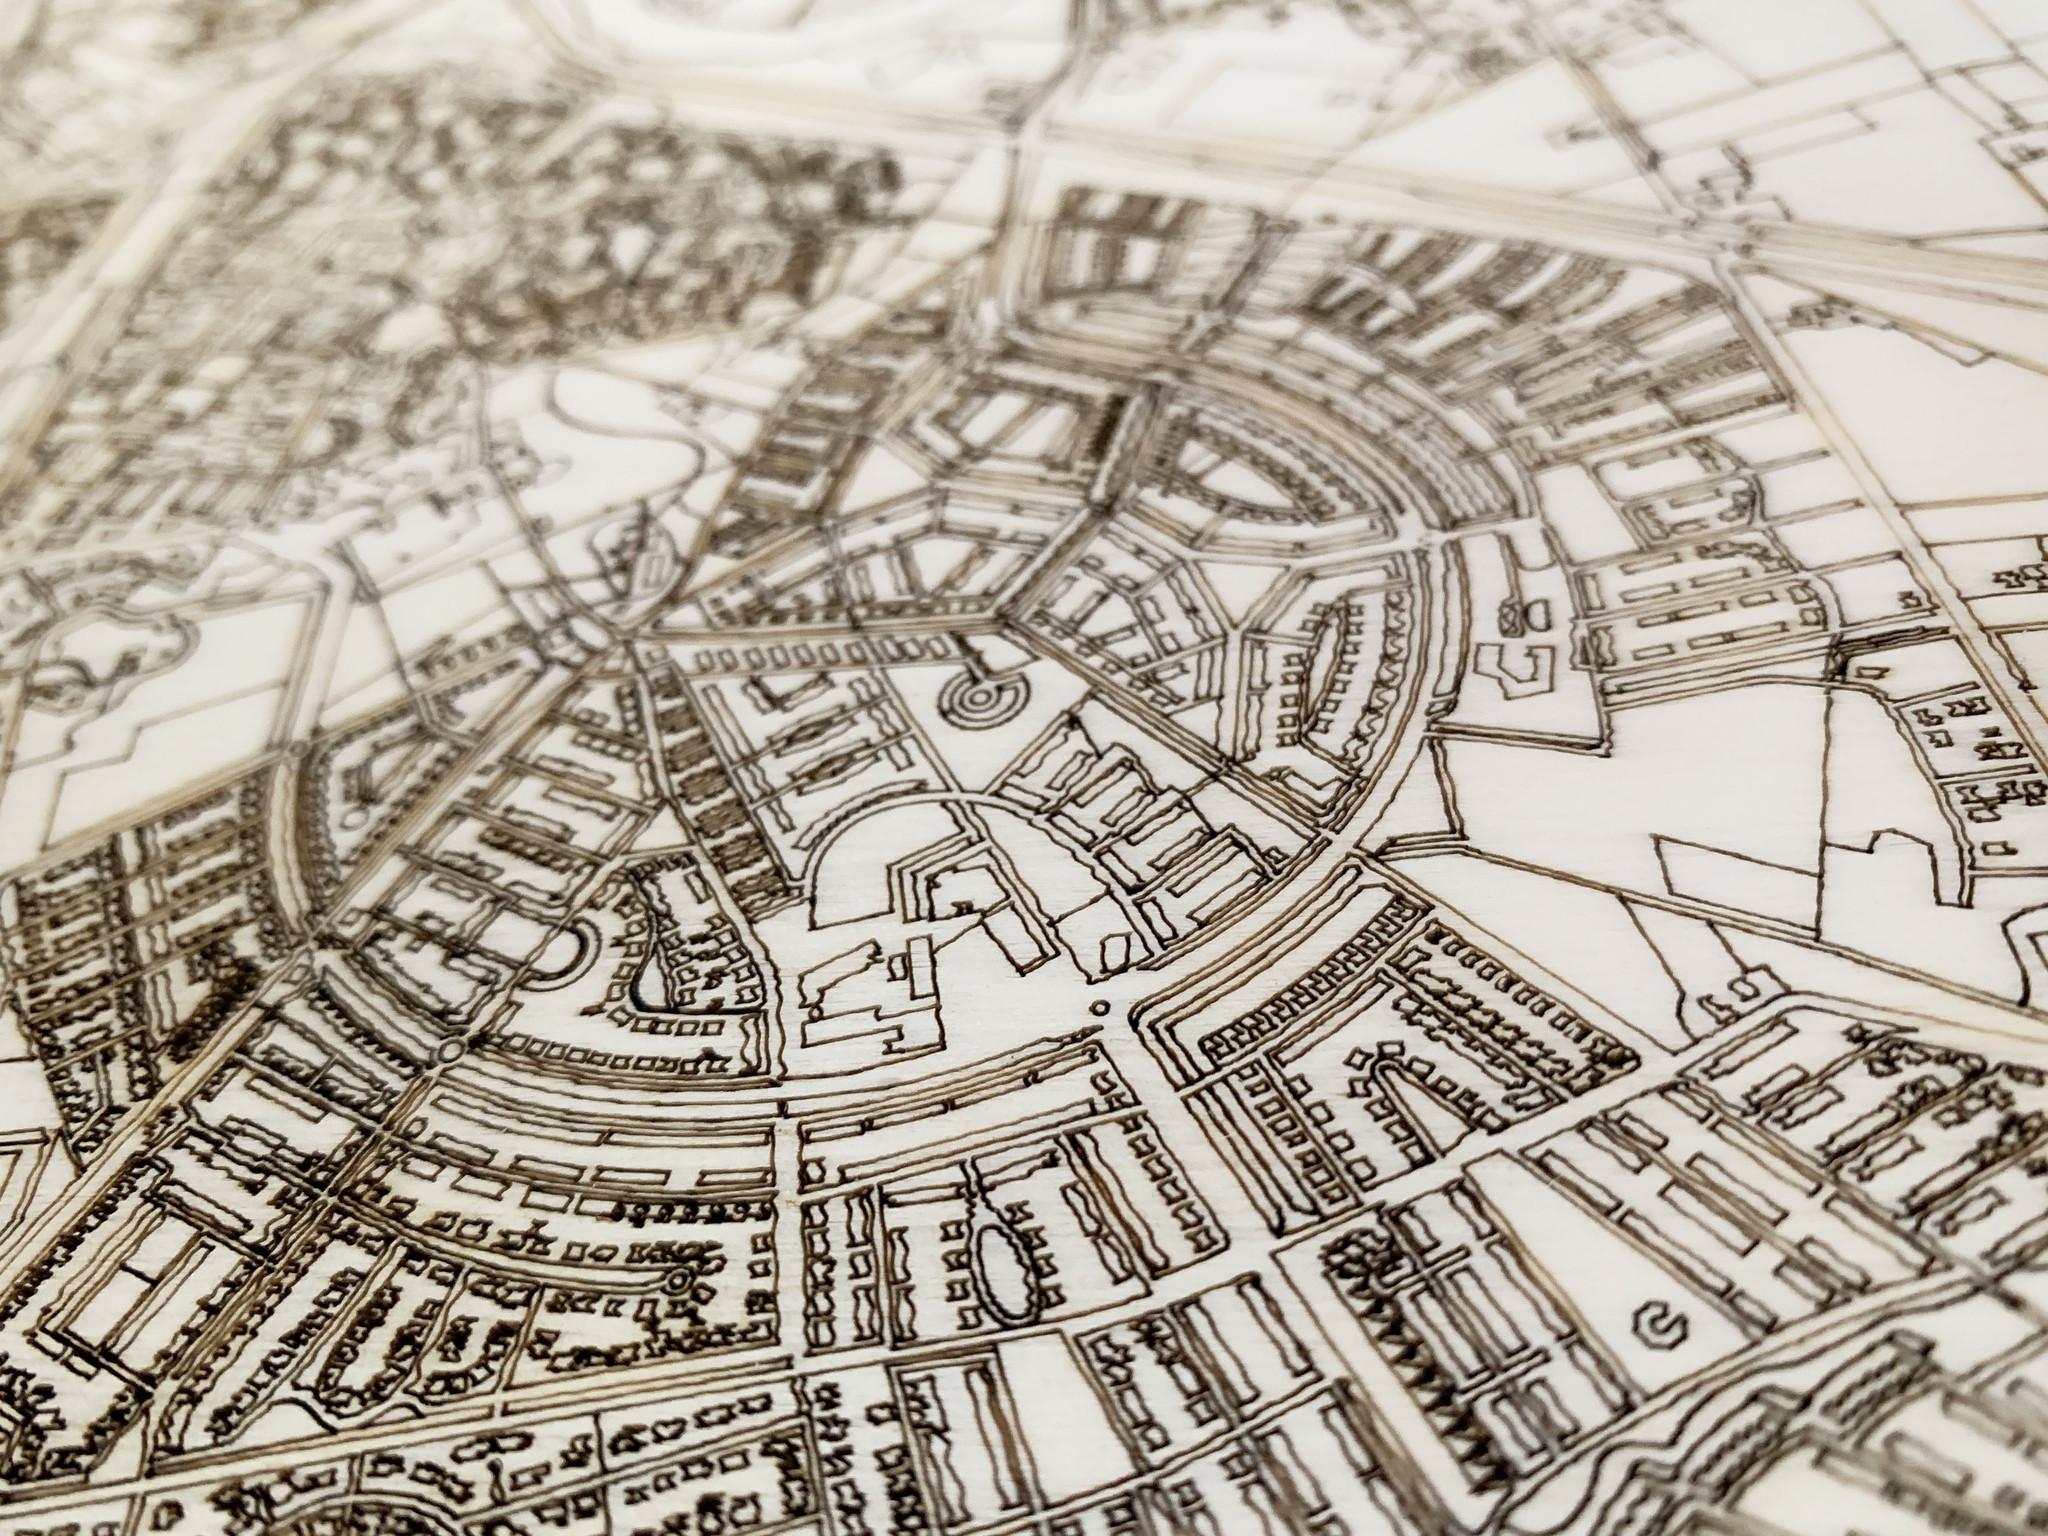 Houten stadsplattegrond Lelystad-3